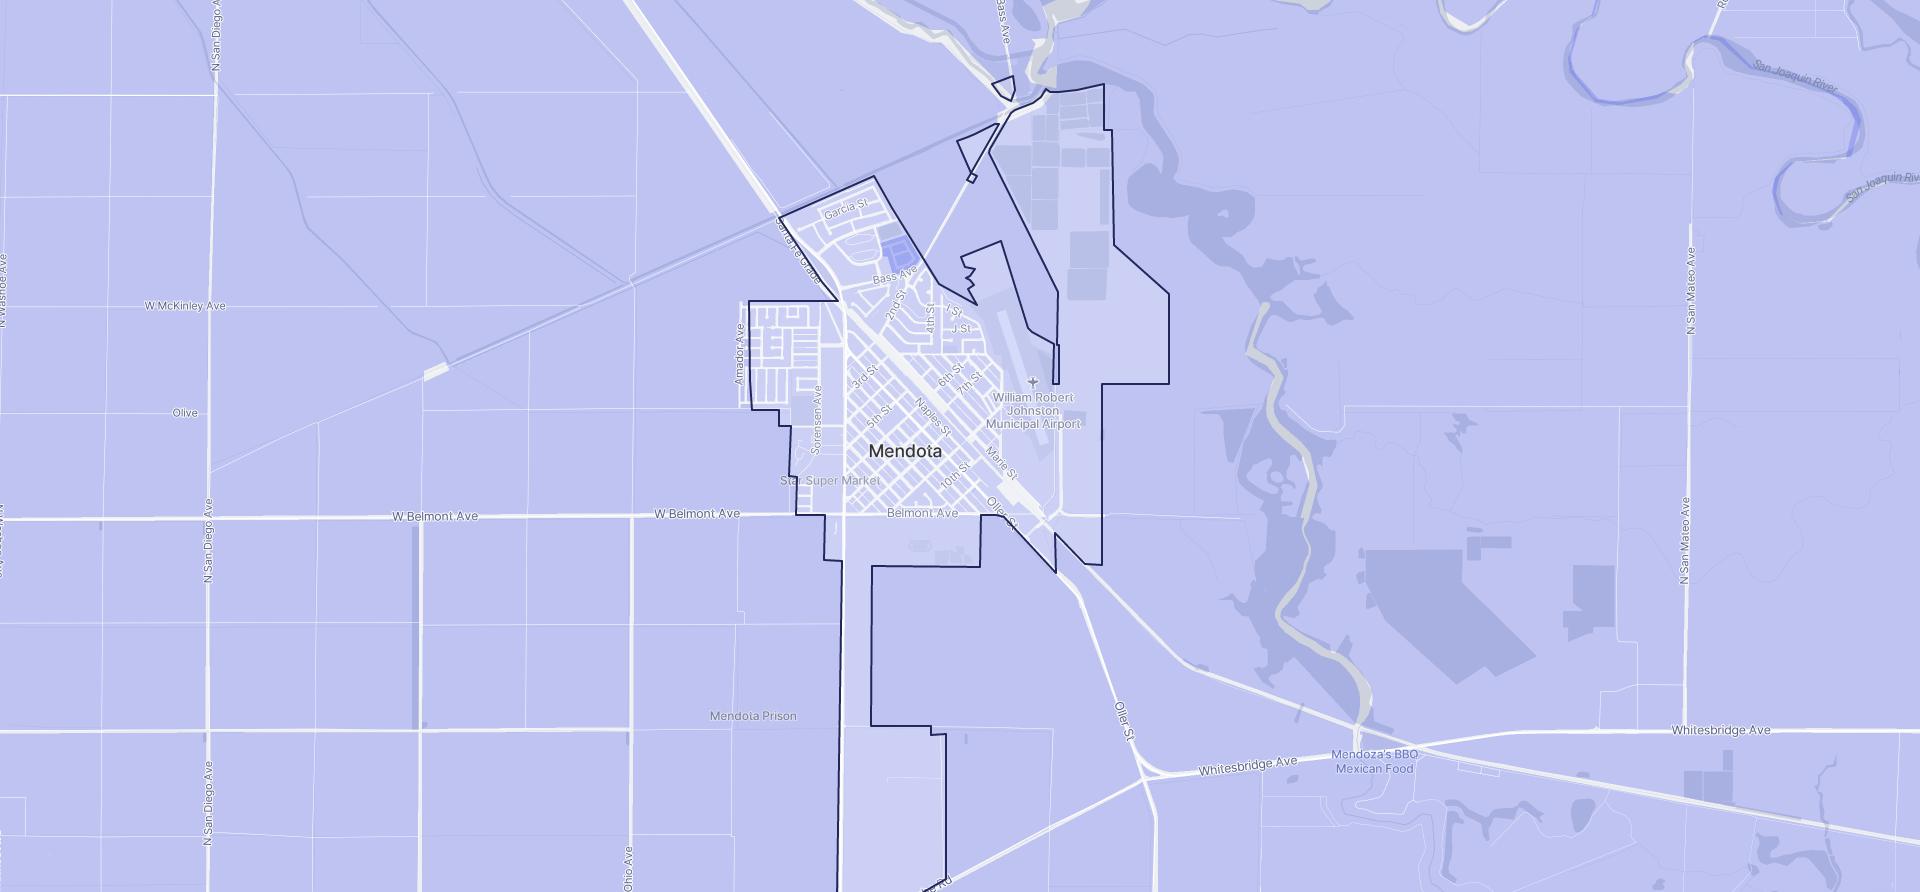 Image of Mendota boundaries on a map.